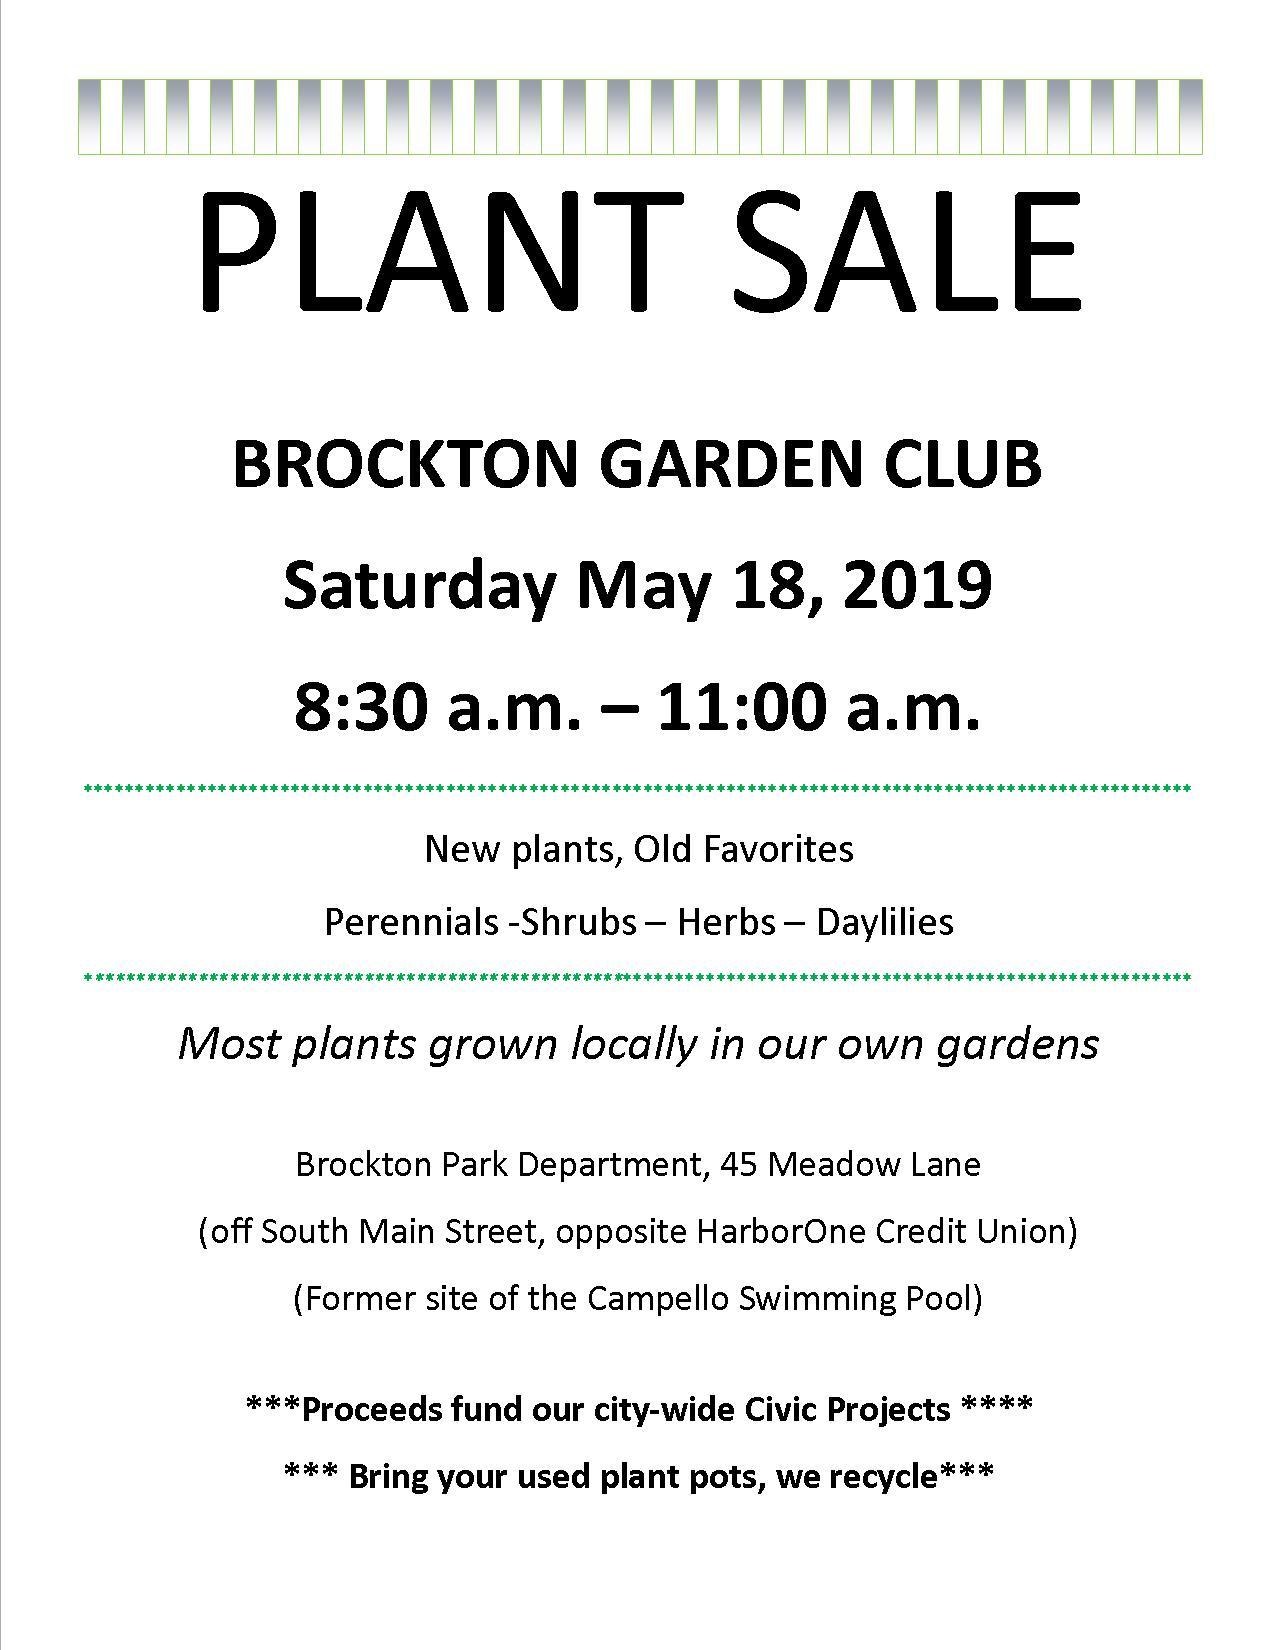 Garden Club Plant Sale, May 18, 2019 - Garden Club